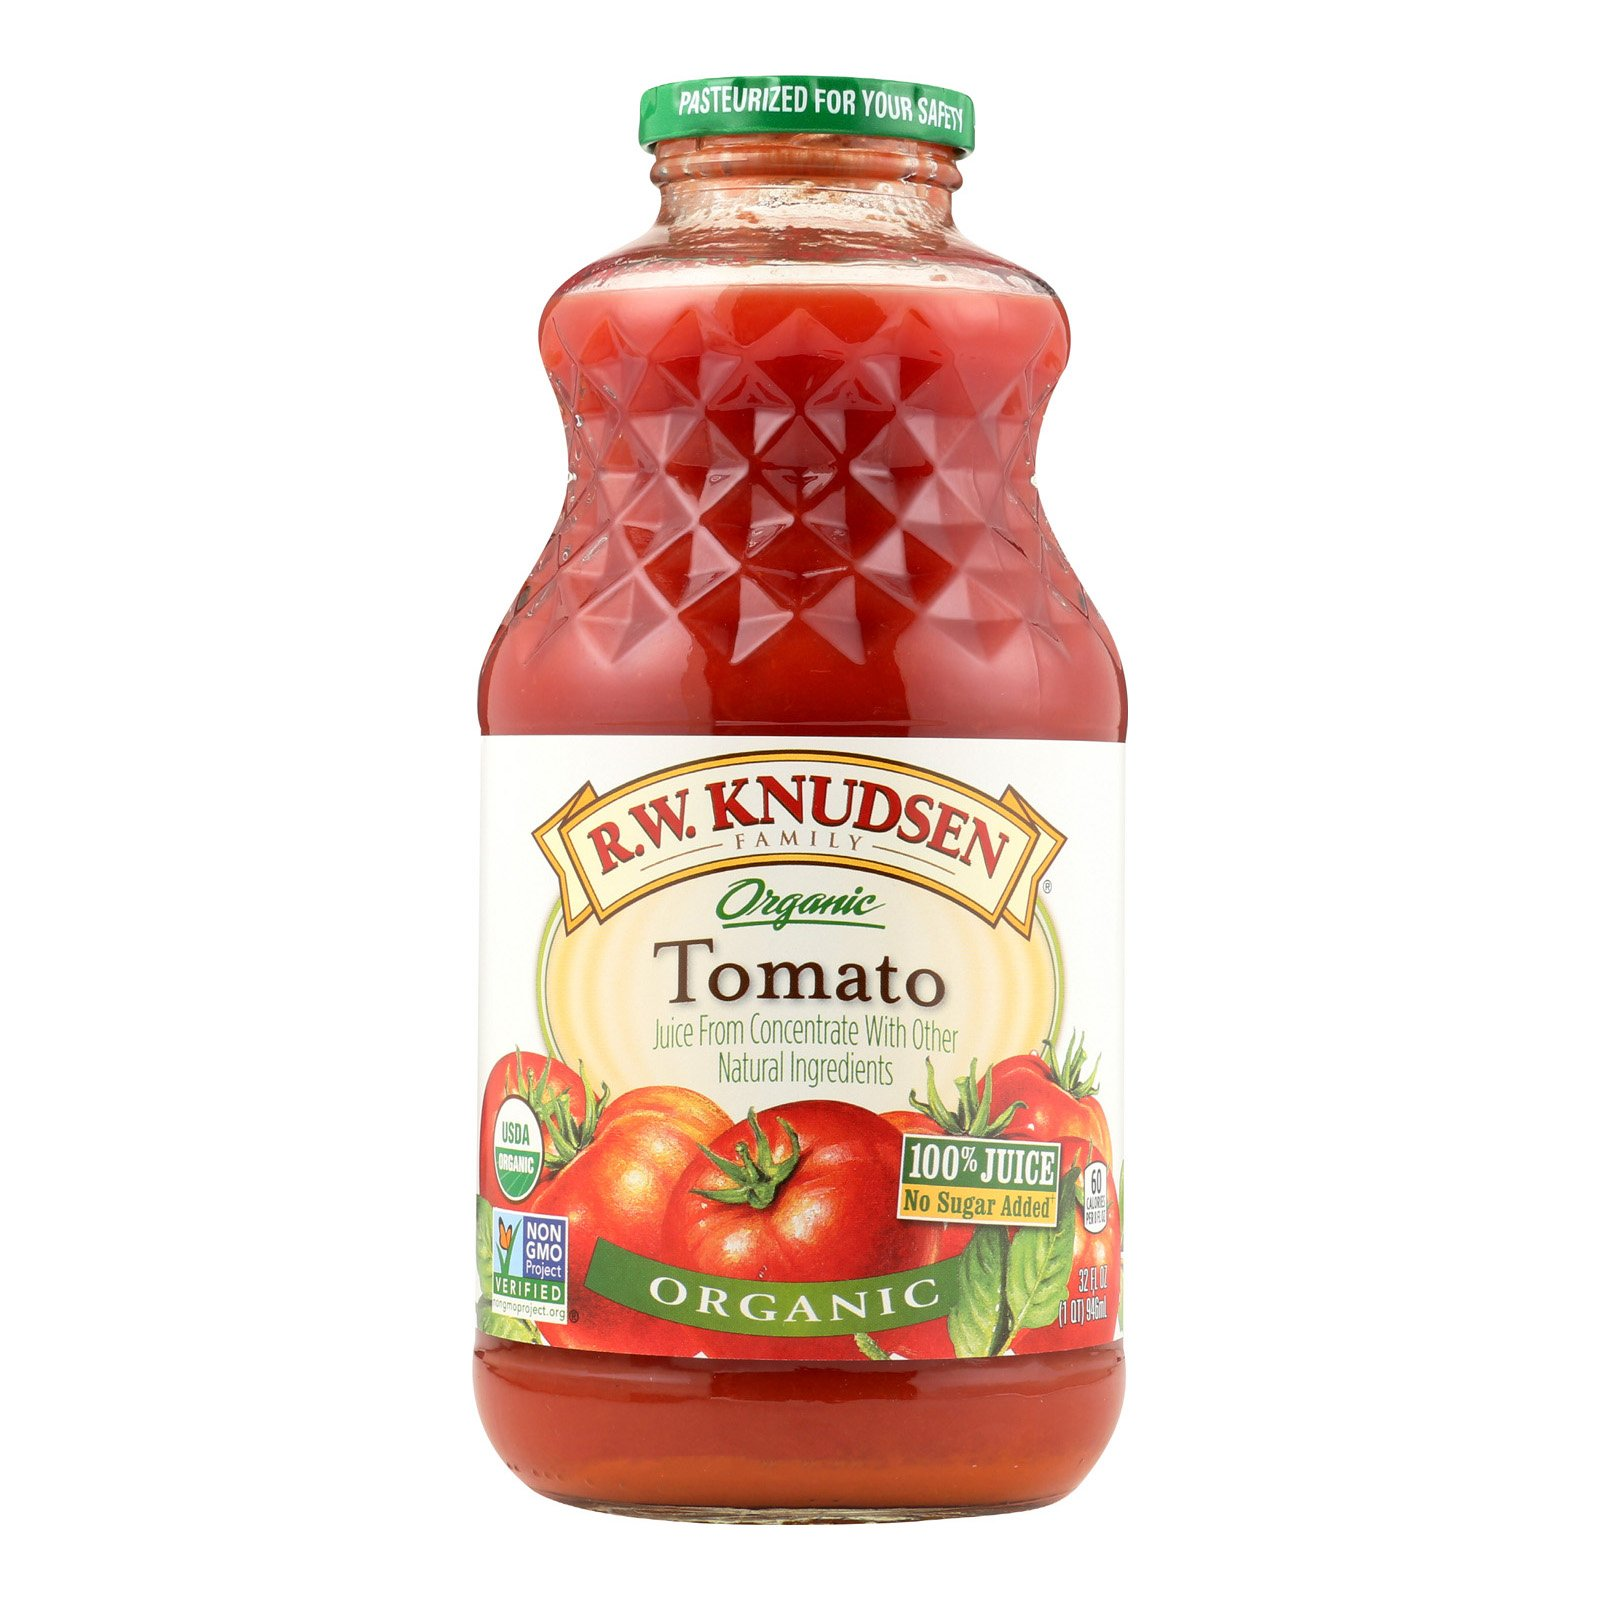 R.W. Knudsen Organic Juice - Tomato - Case of 12 - 32 Fl oz.